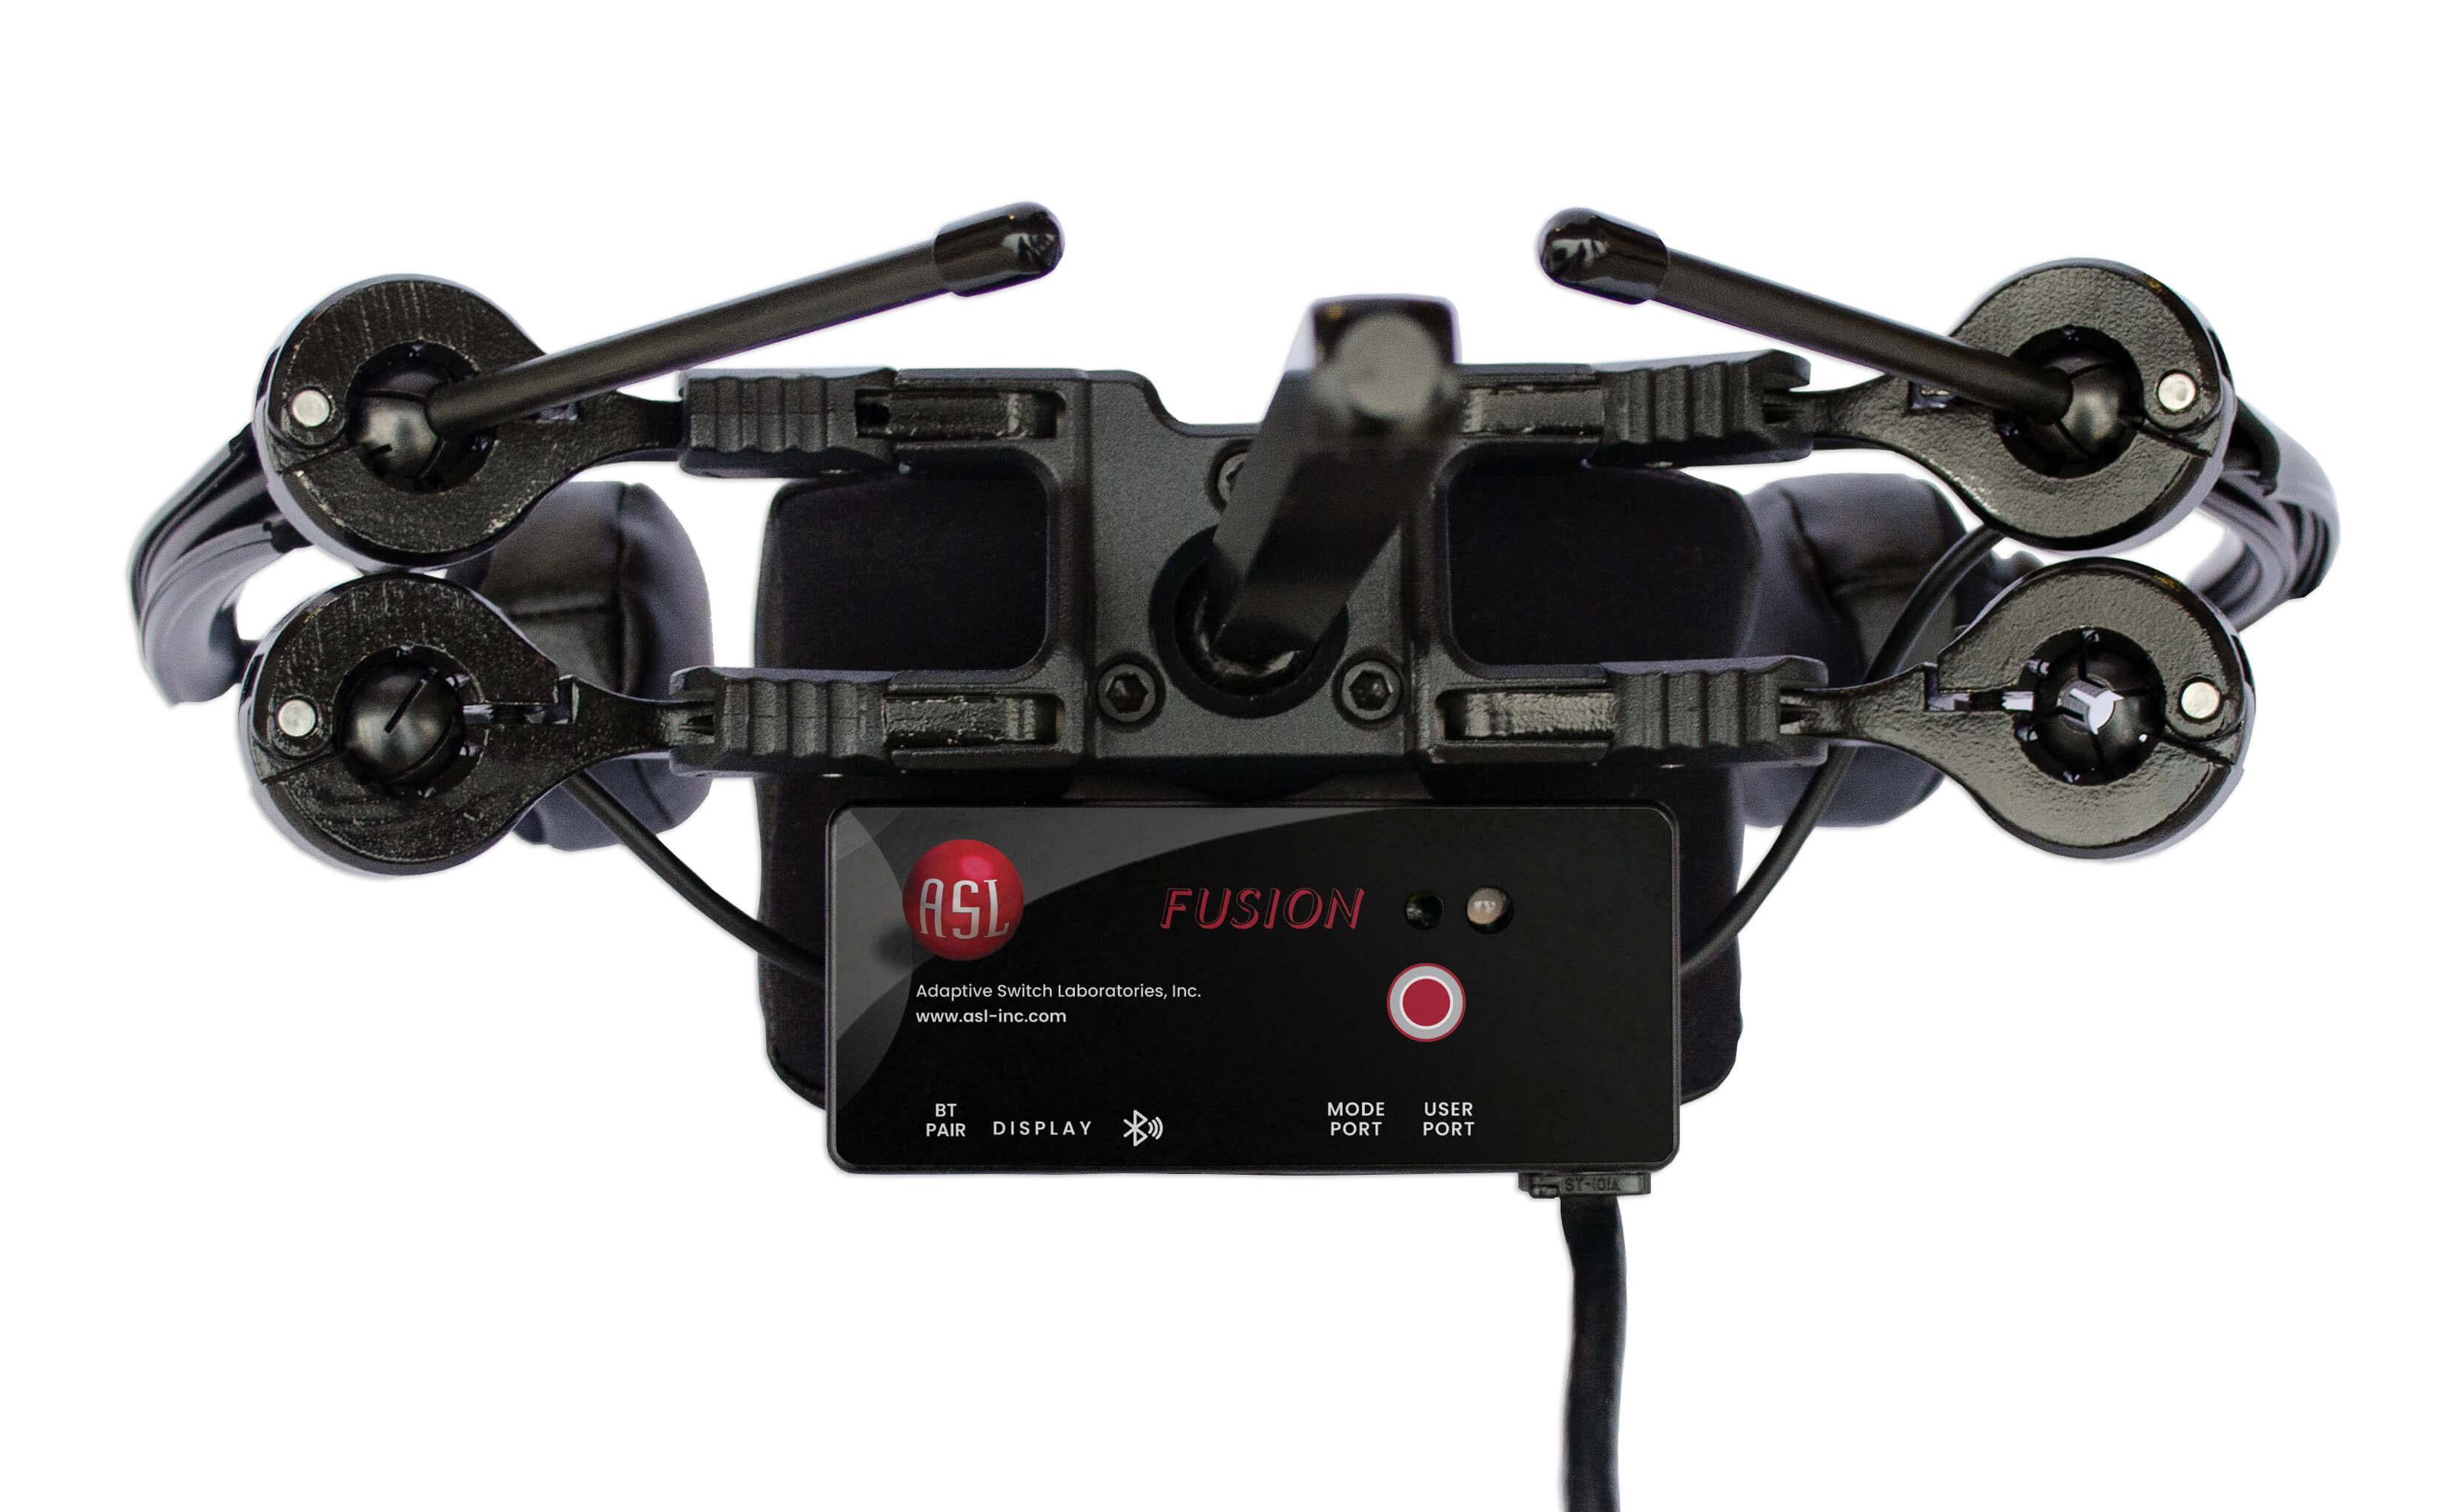 ASl 110 Fusion Back View of Box